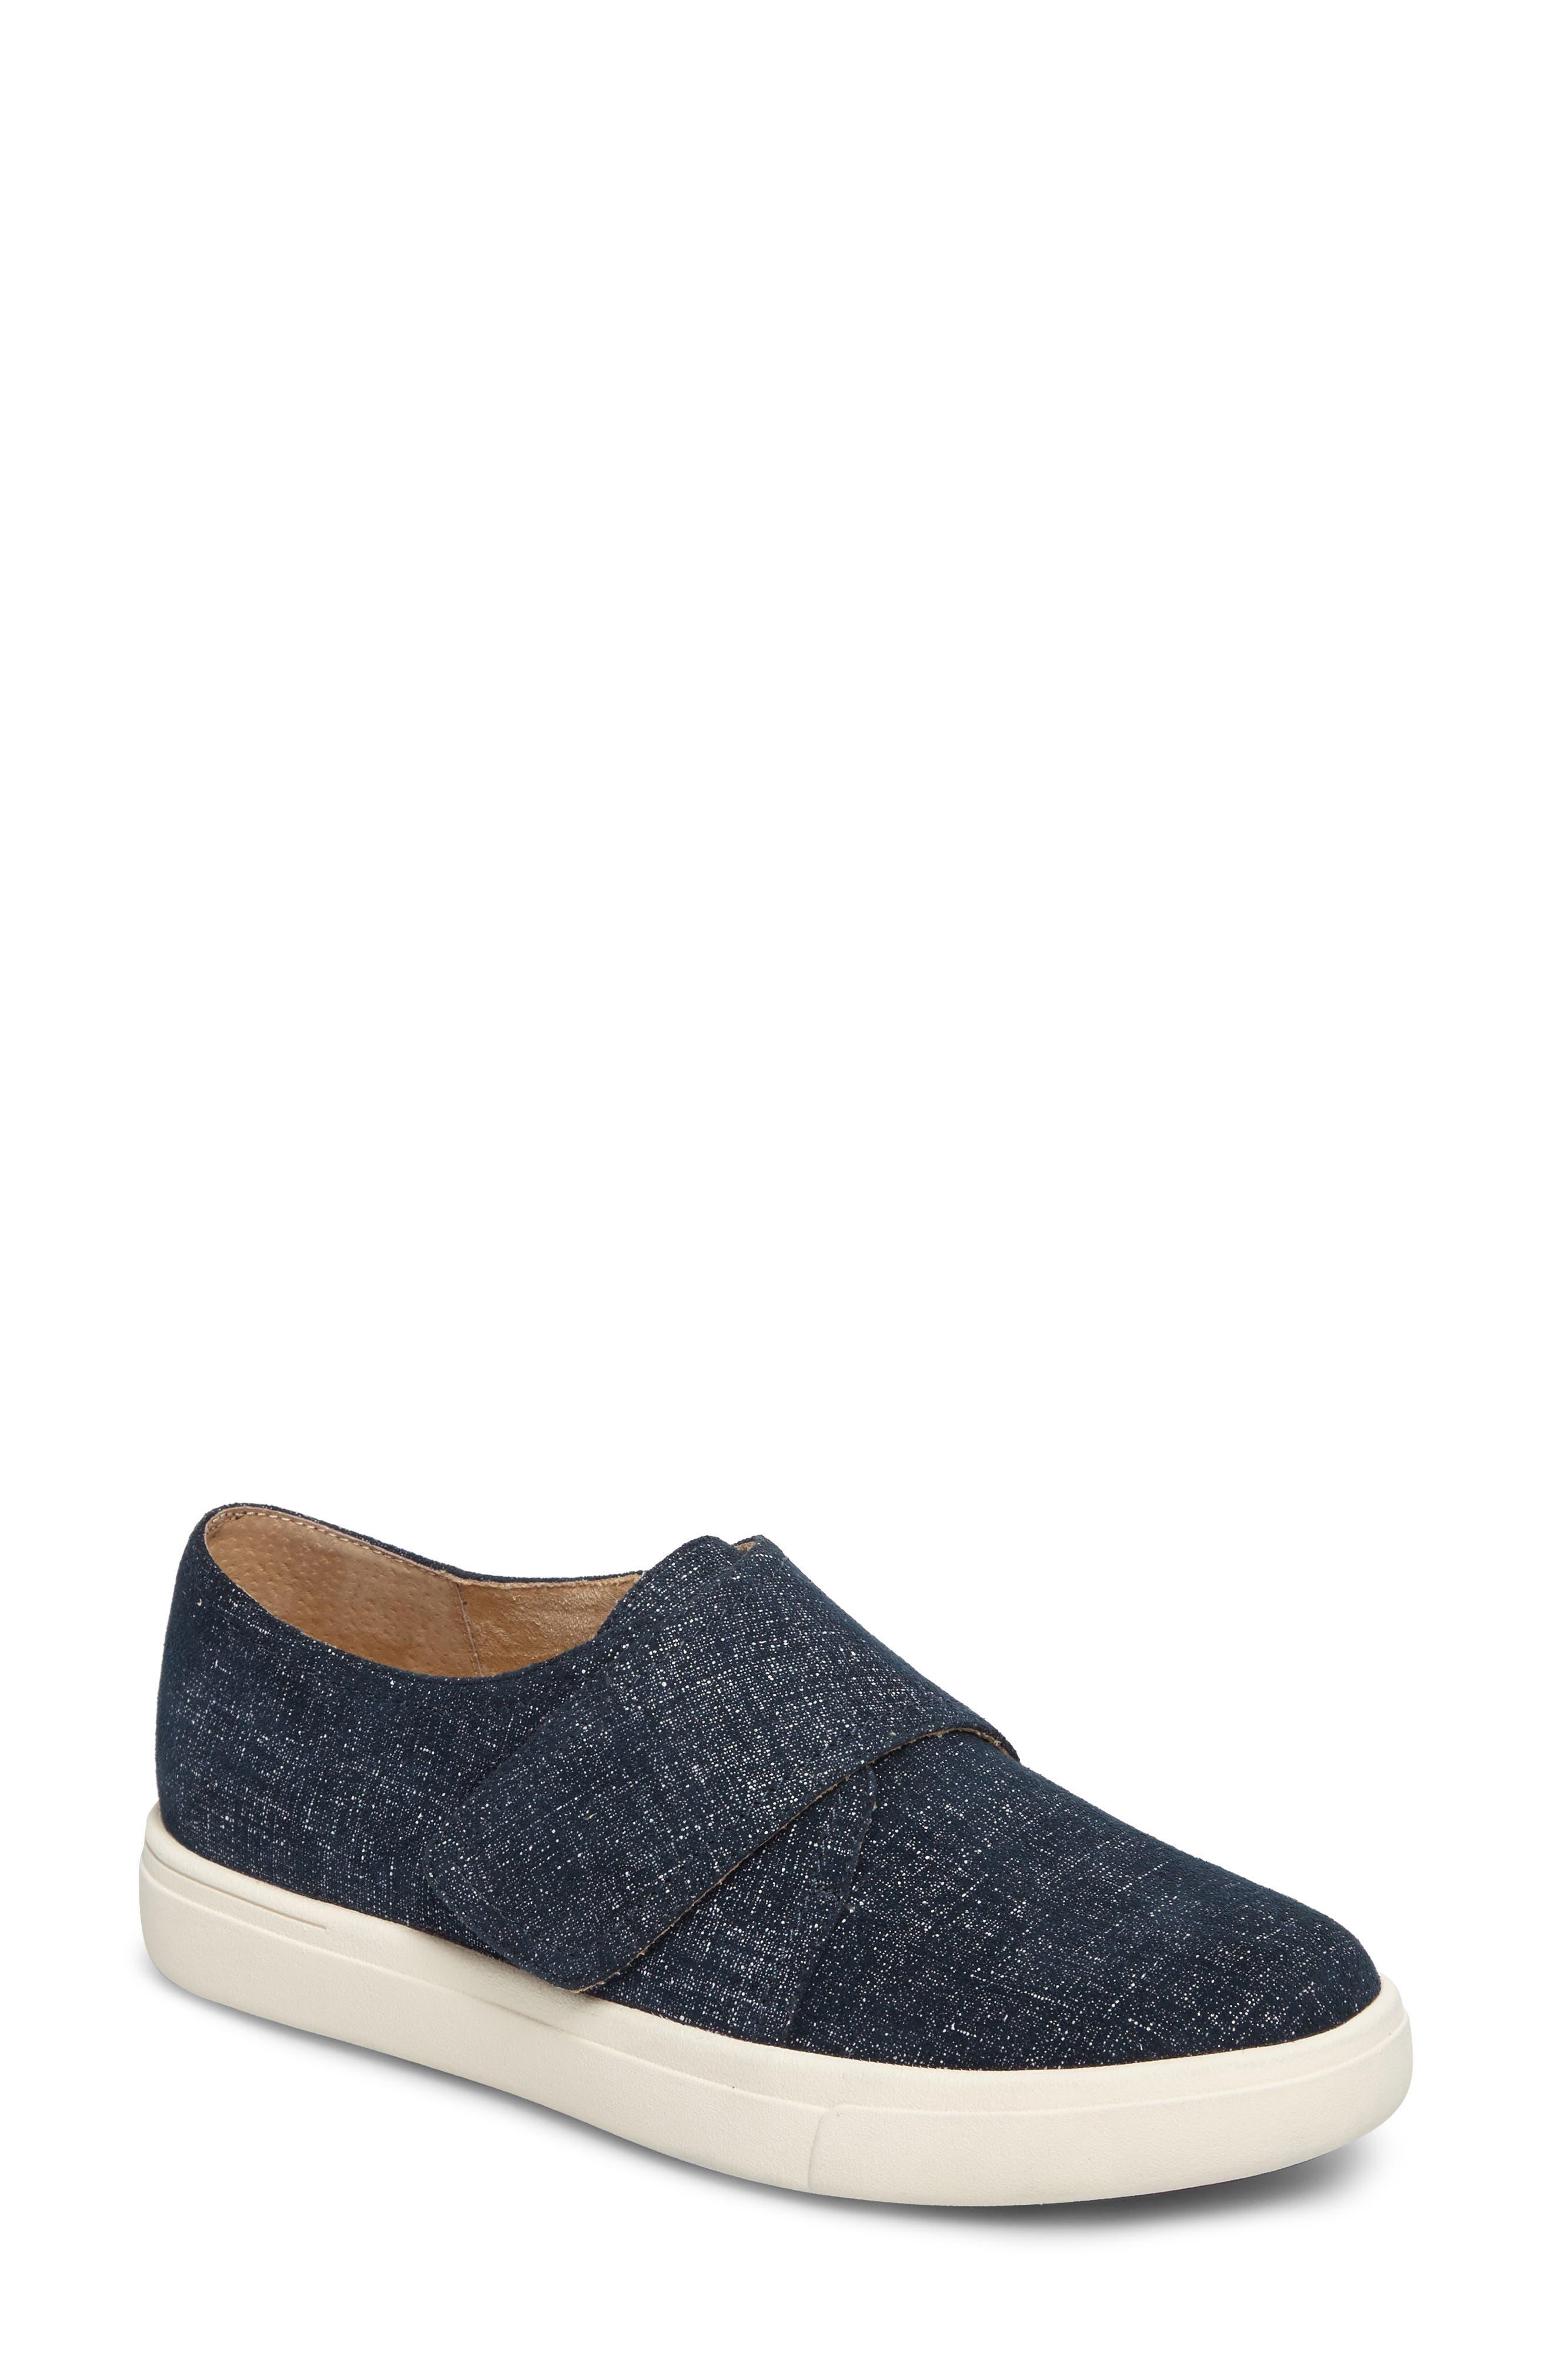 VANELI,                             Oberon Slip-On Sneaker,                             Main thumbnail 1, color,                             JEANS PRINTED SUEDE